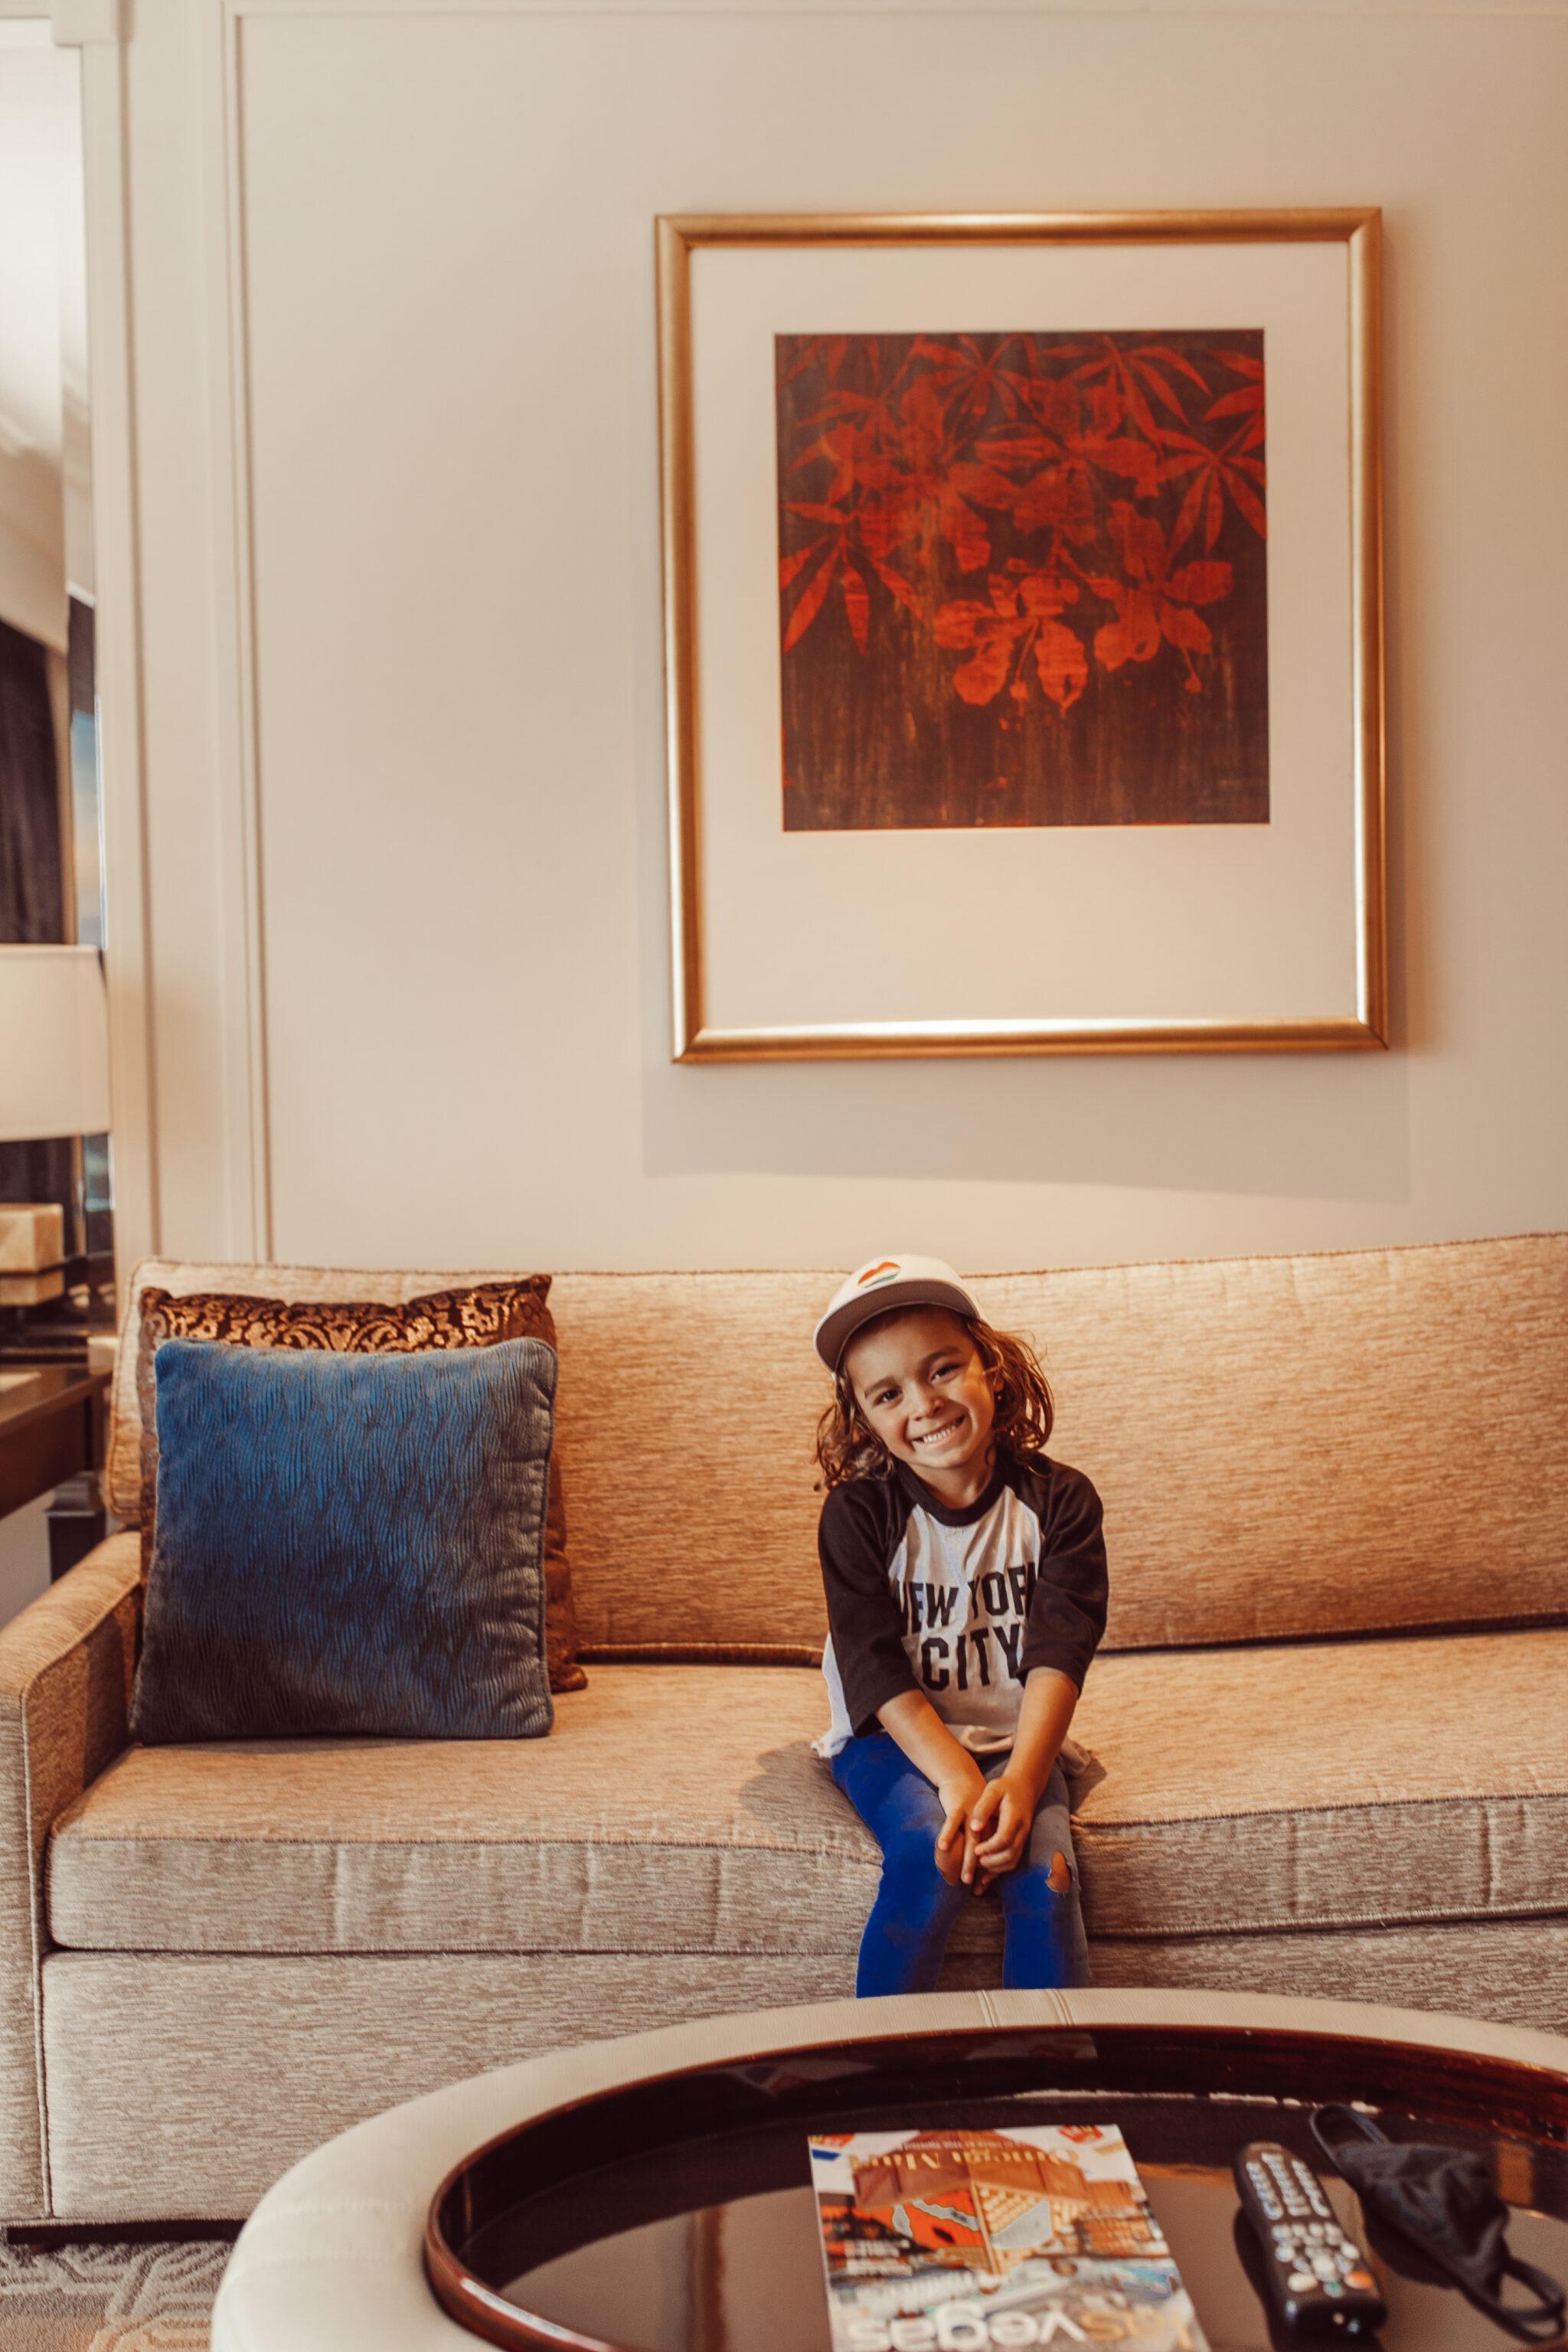 boy sitting on couch